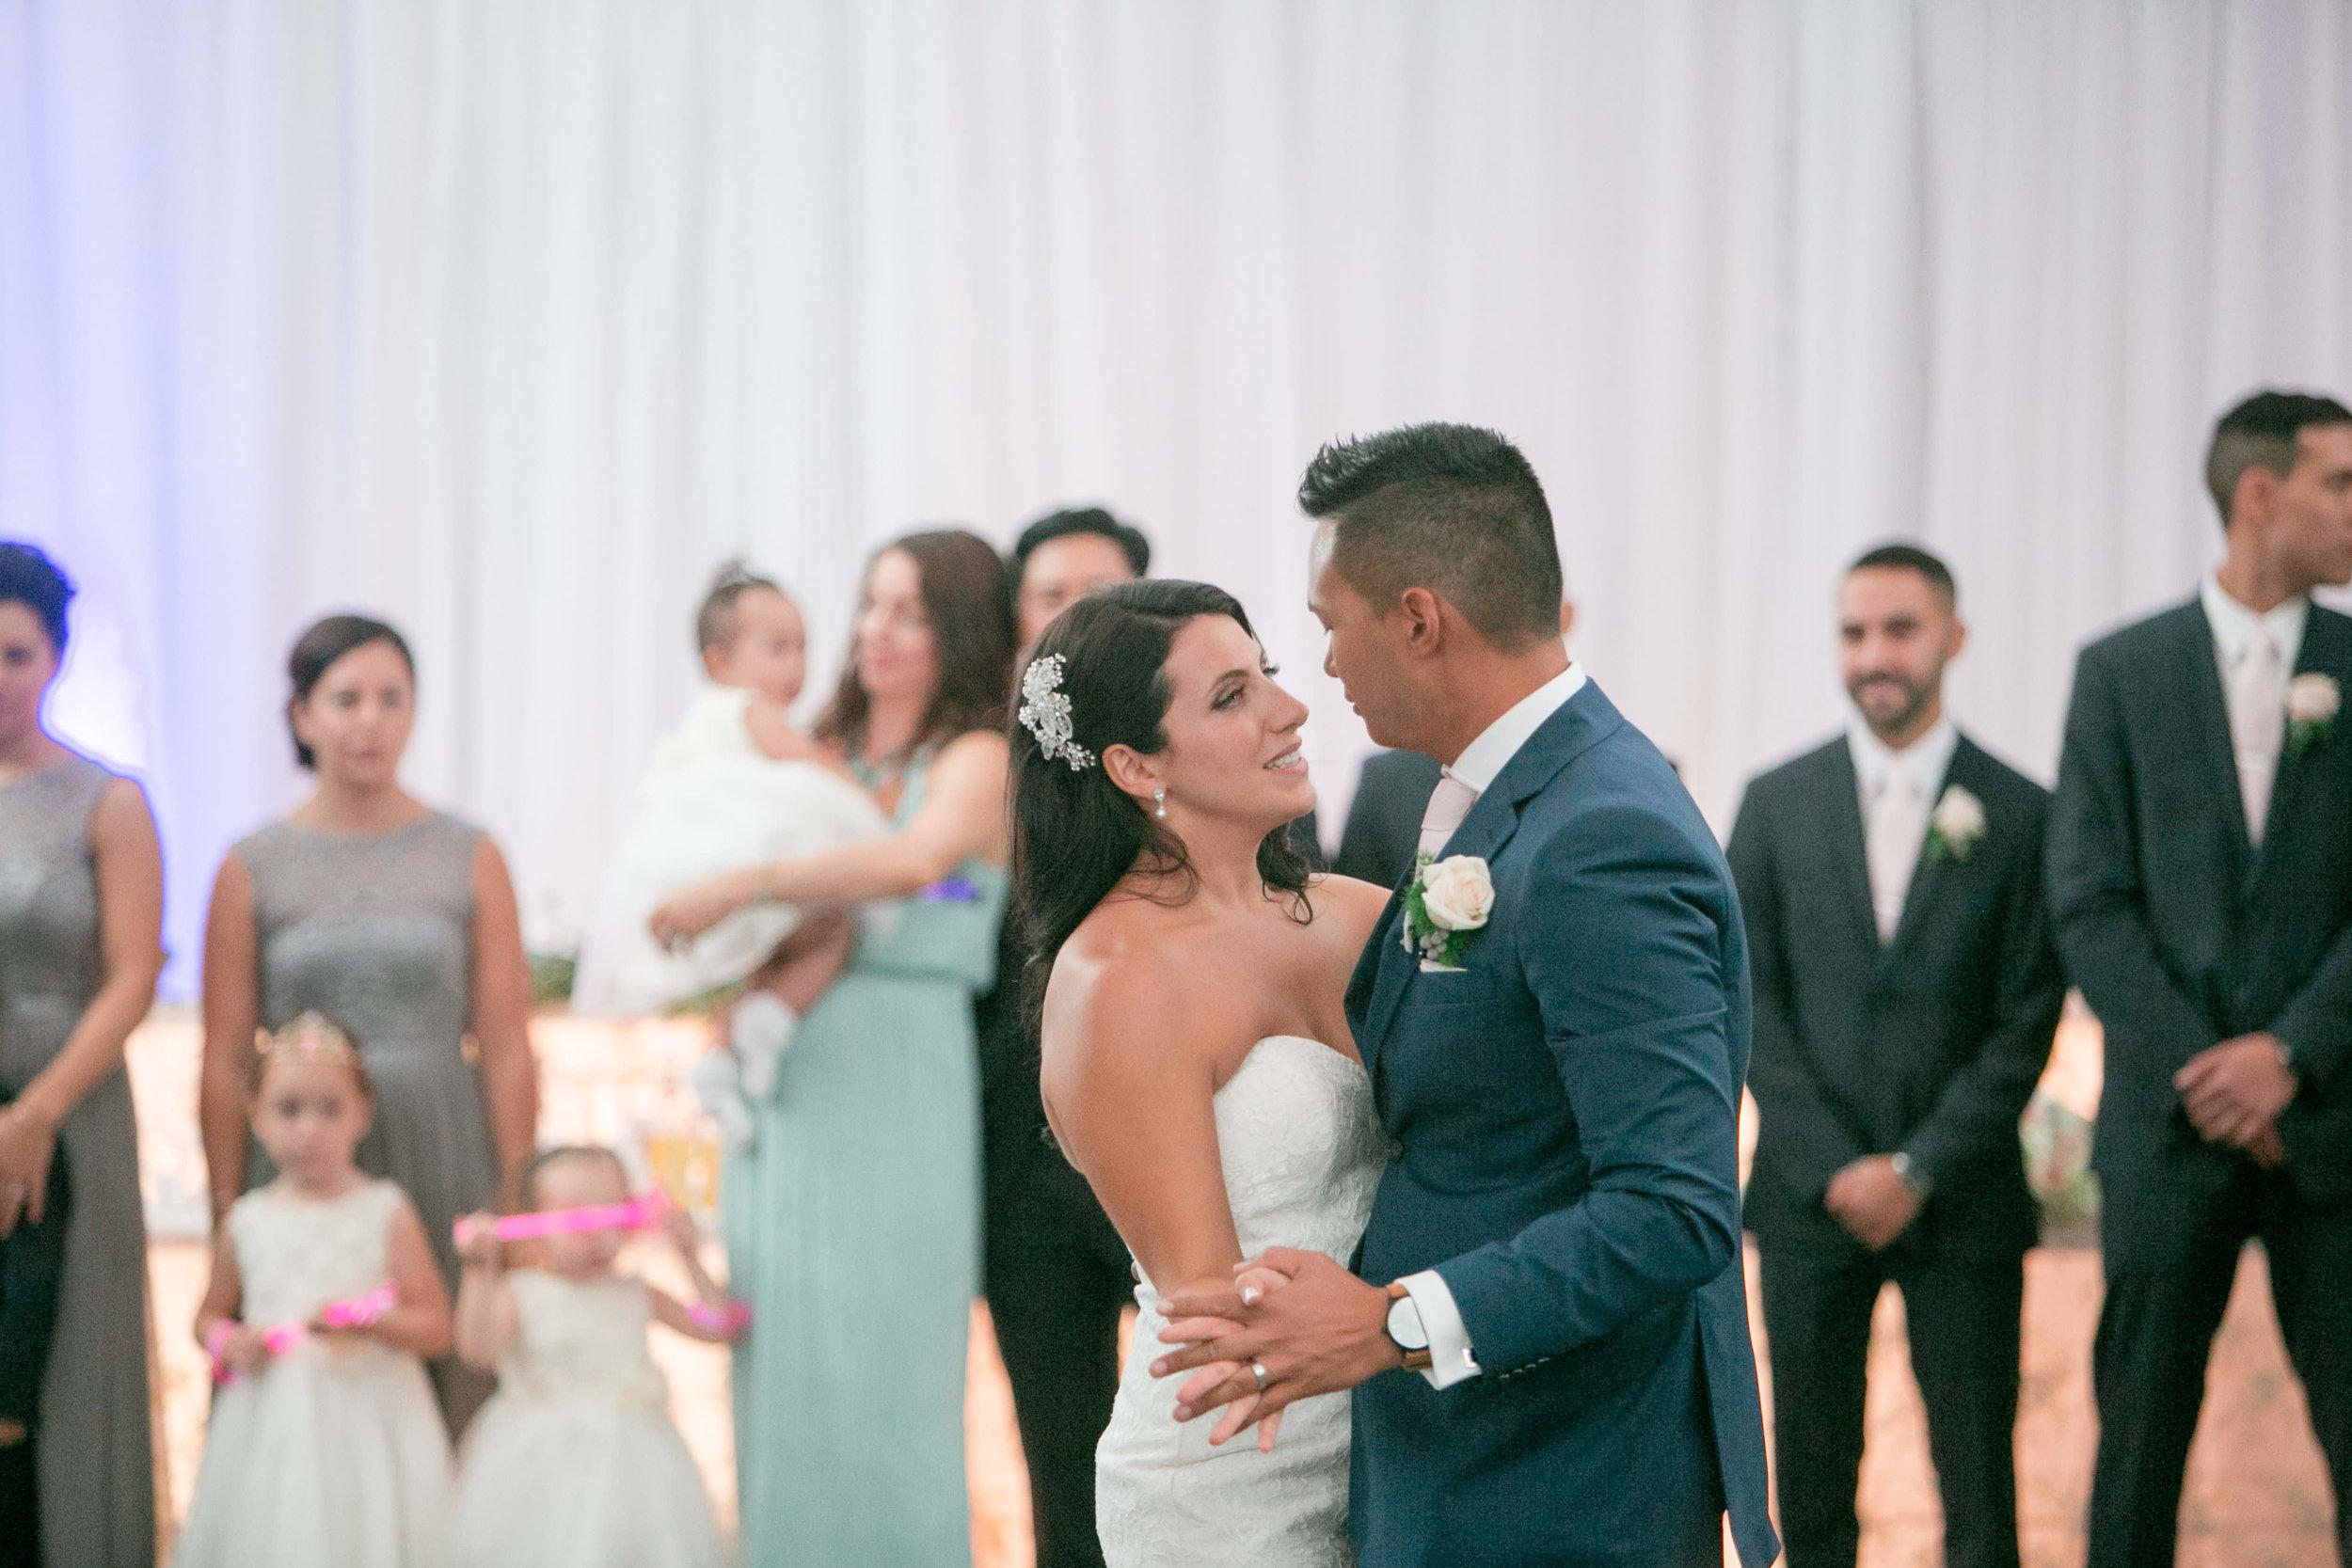 Stefanie___Bernard___Daniel_Ricci_Weddings_High_Res._Finals__539.jpg